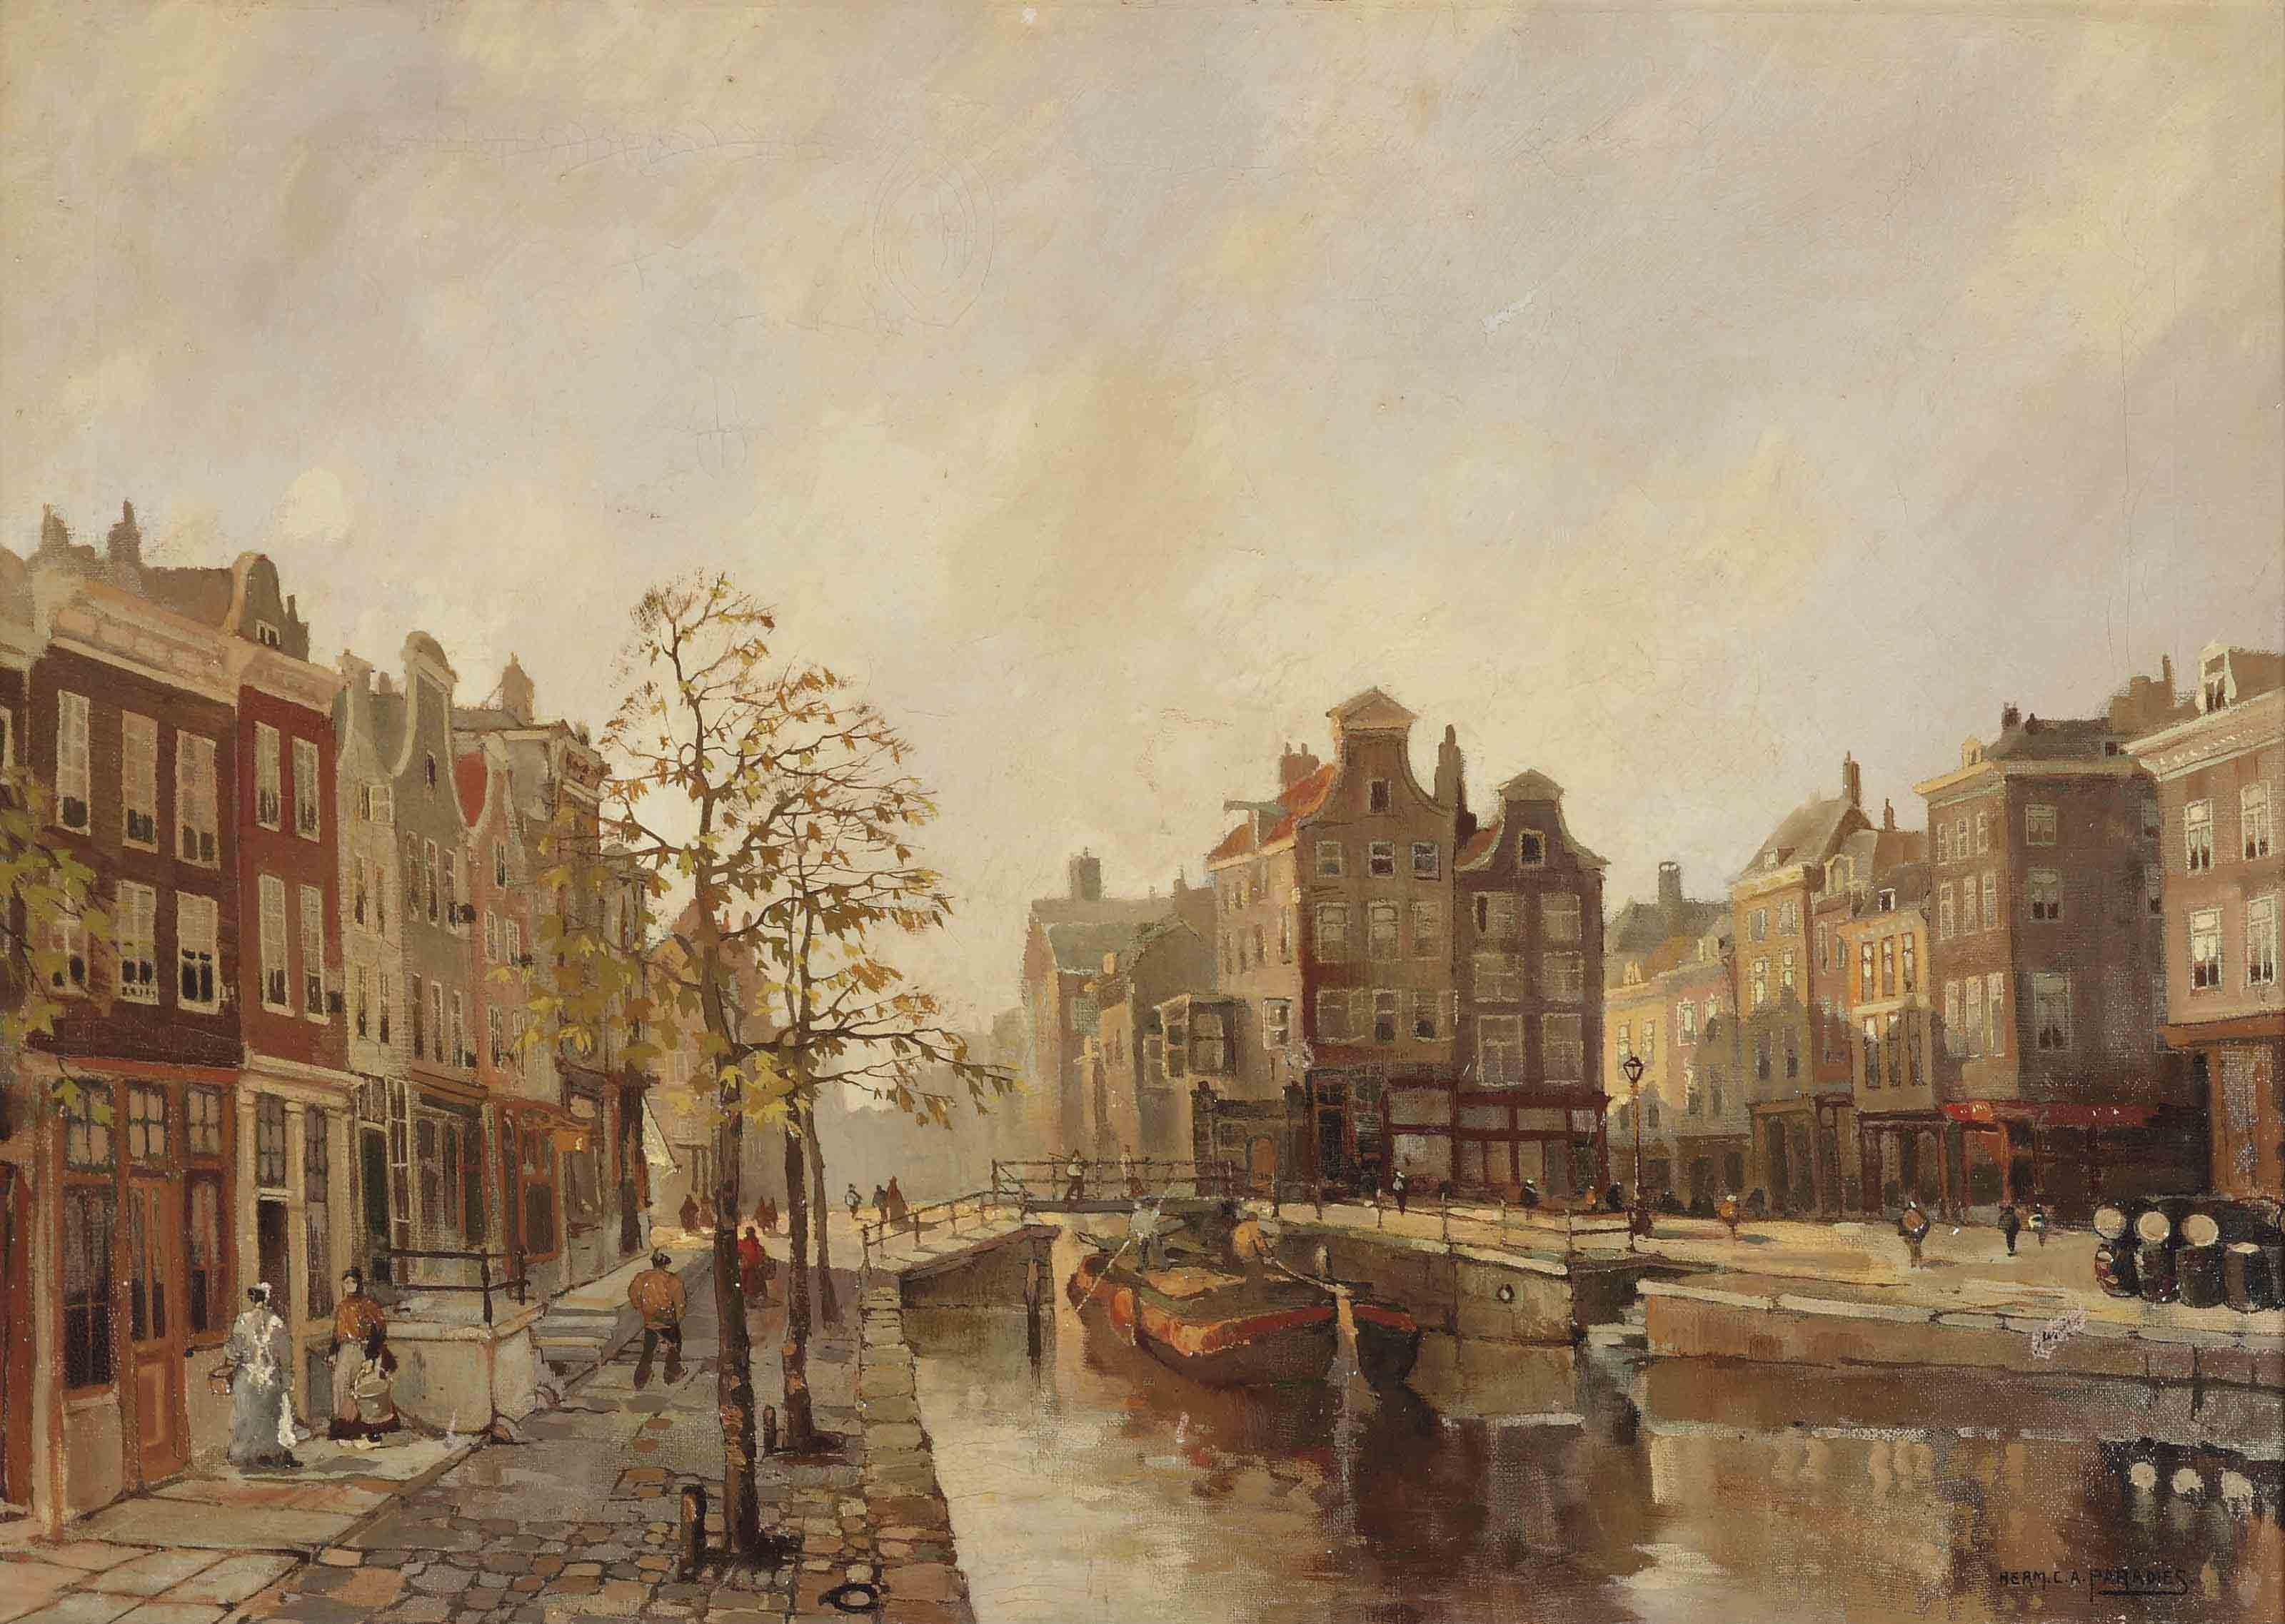 Het Haagse Veer, Rotterdam